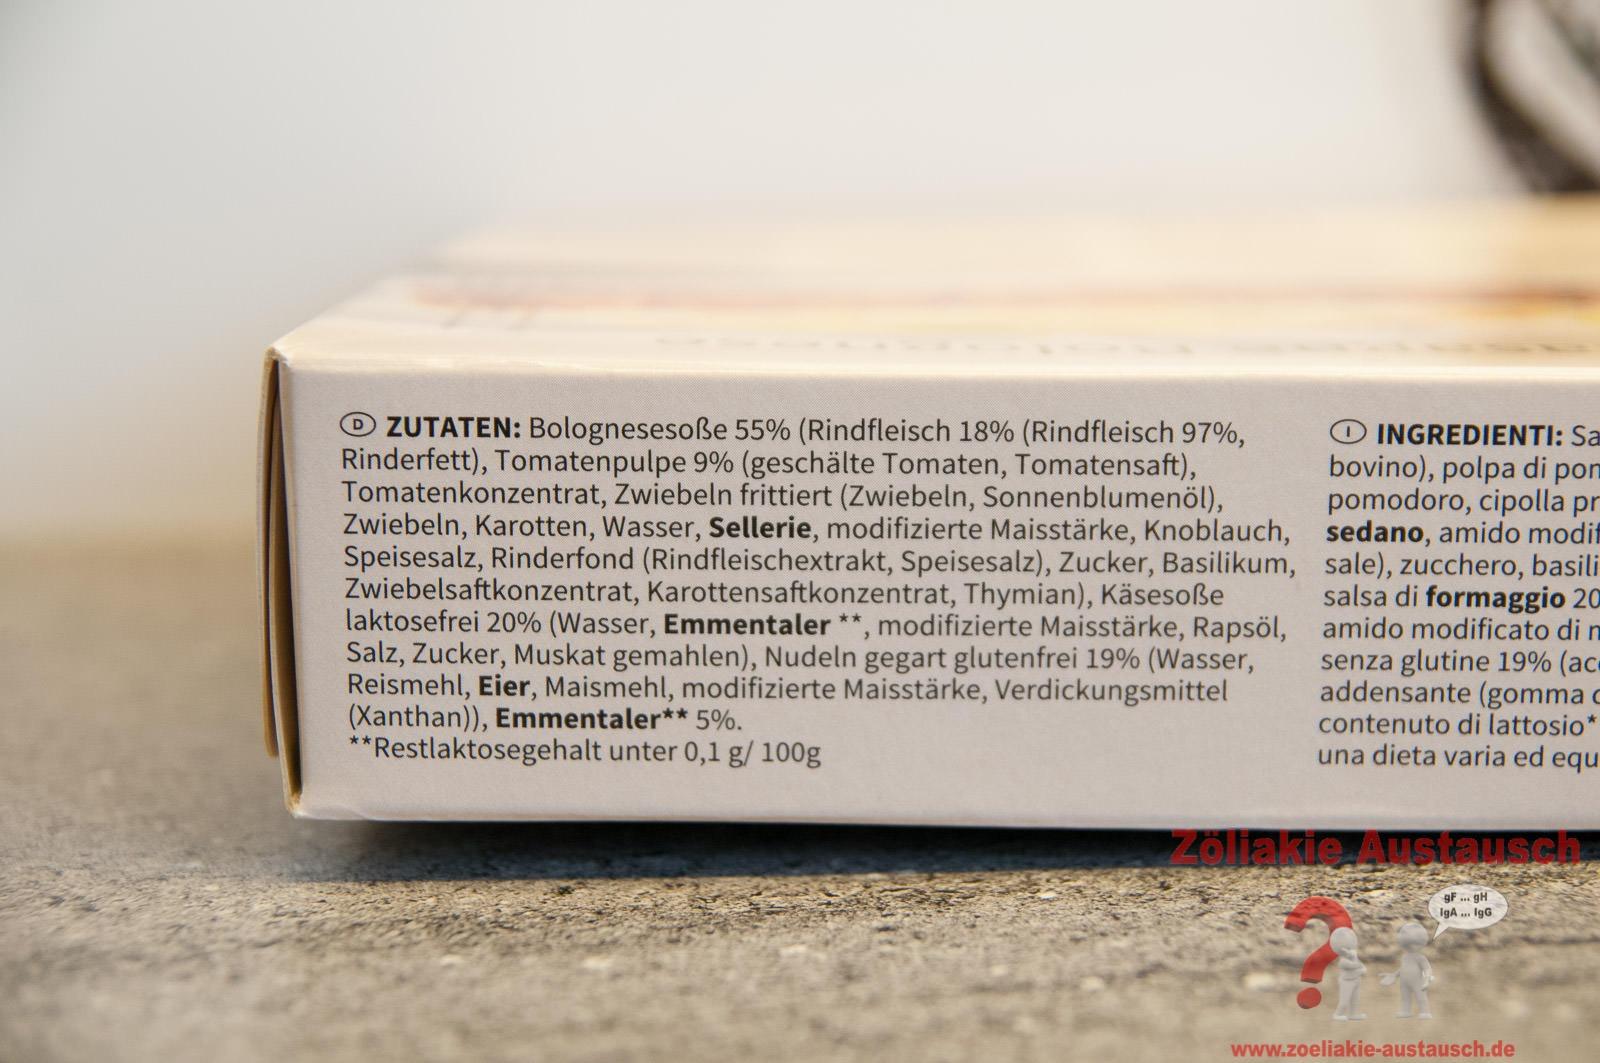 Zoeliakie_Austausch_BoFrost-002